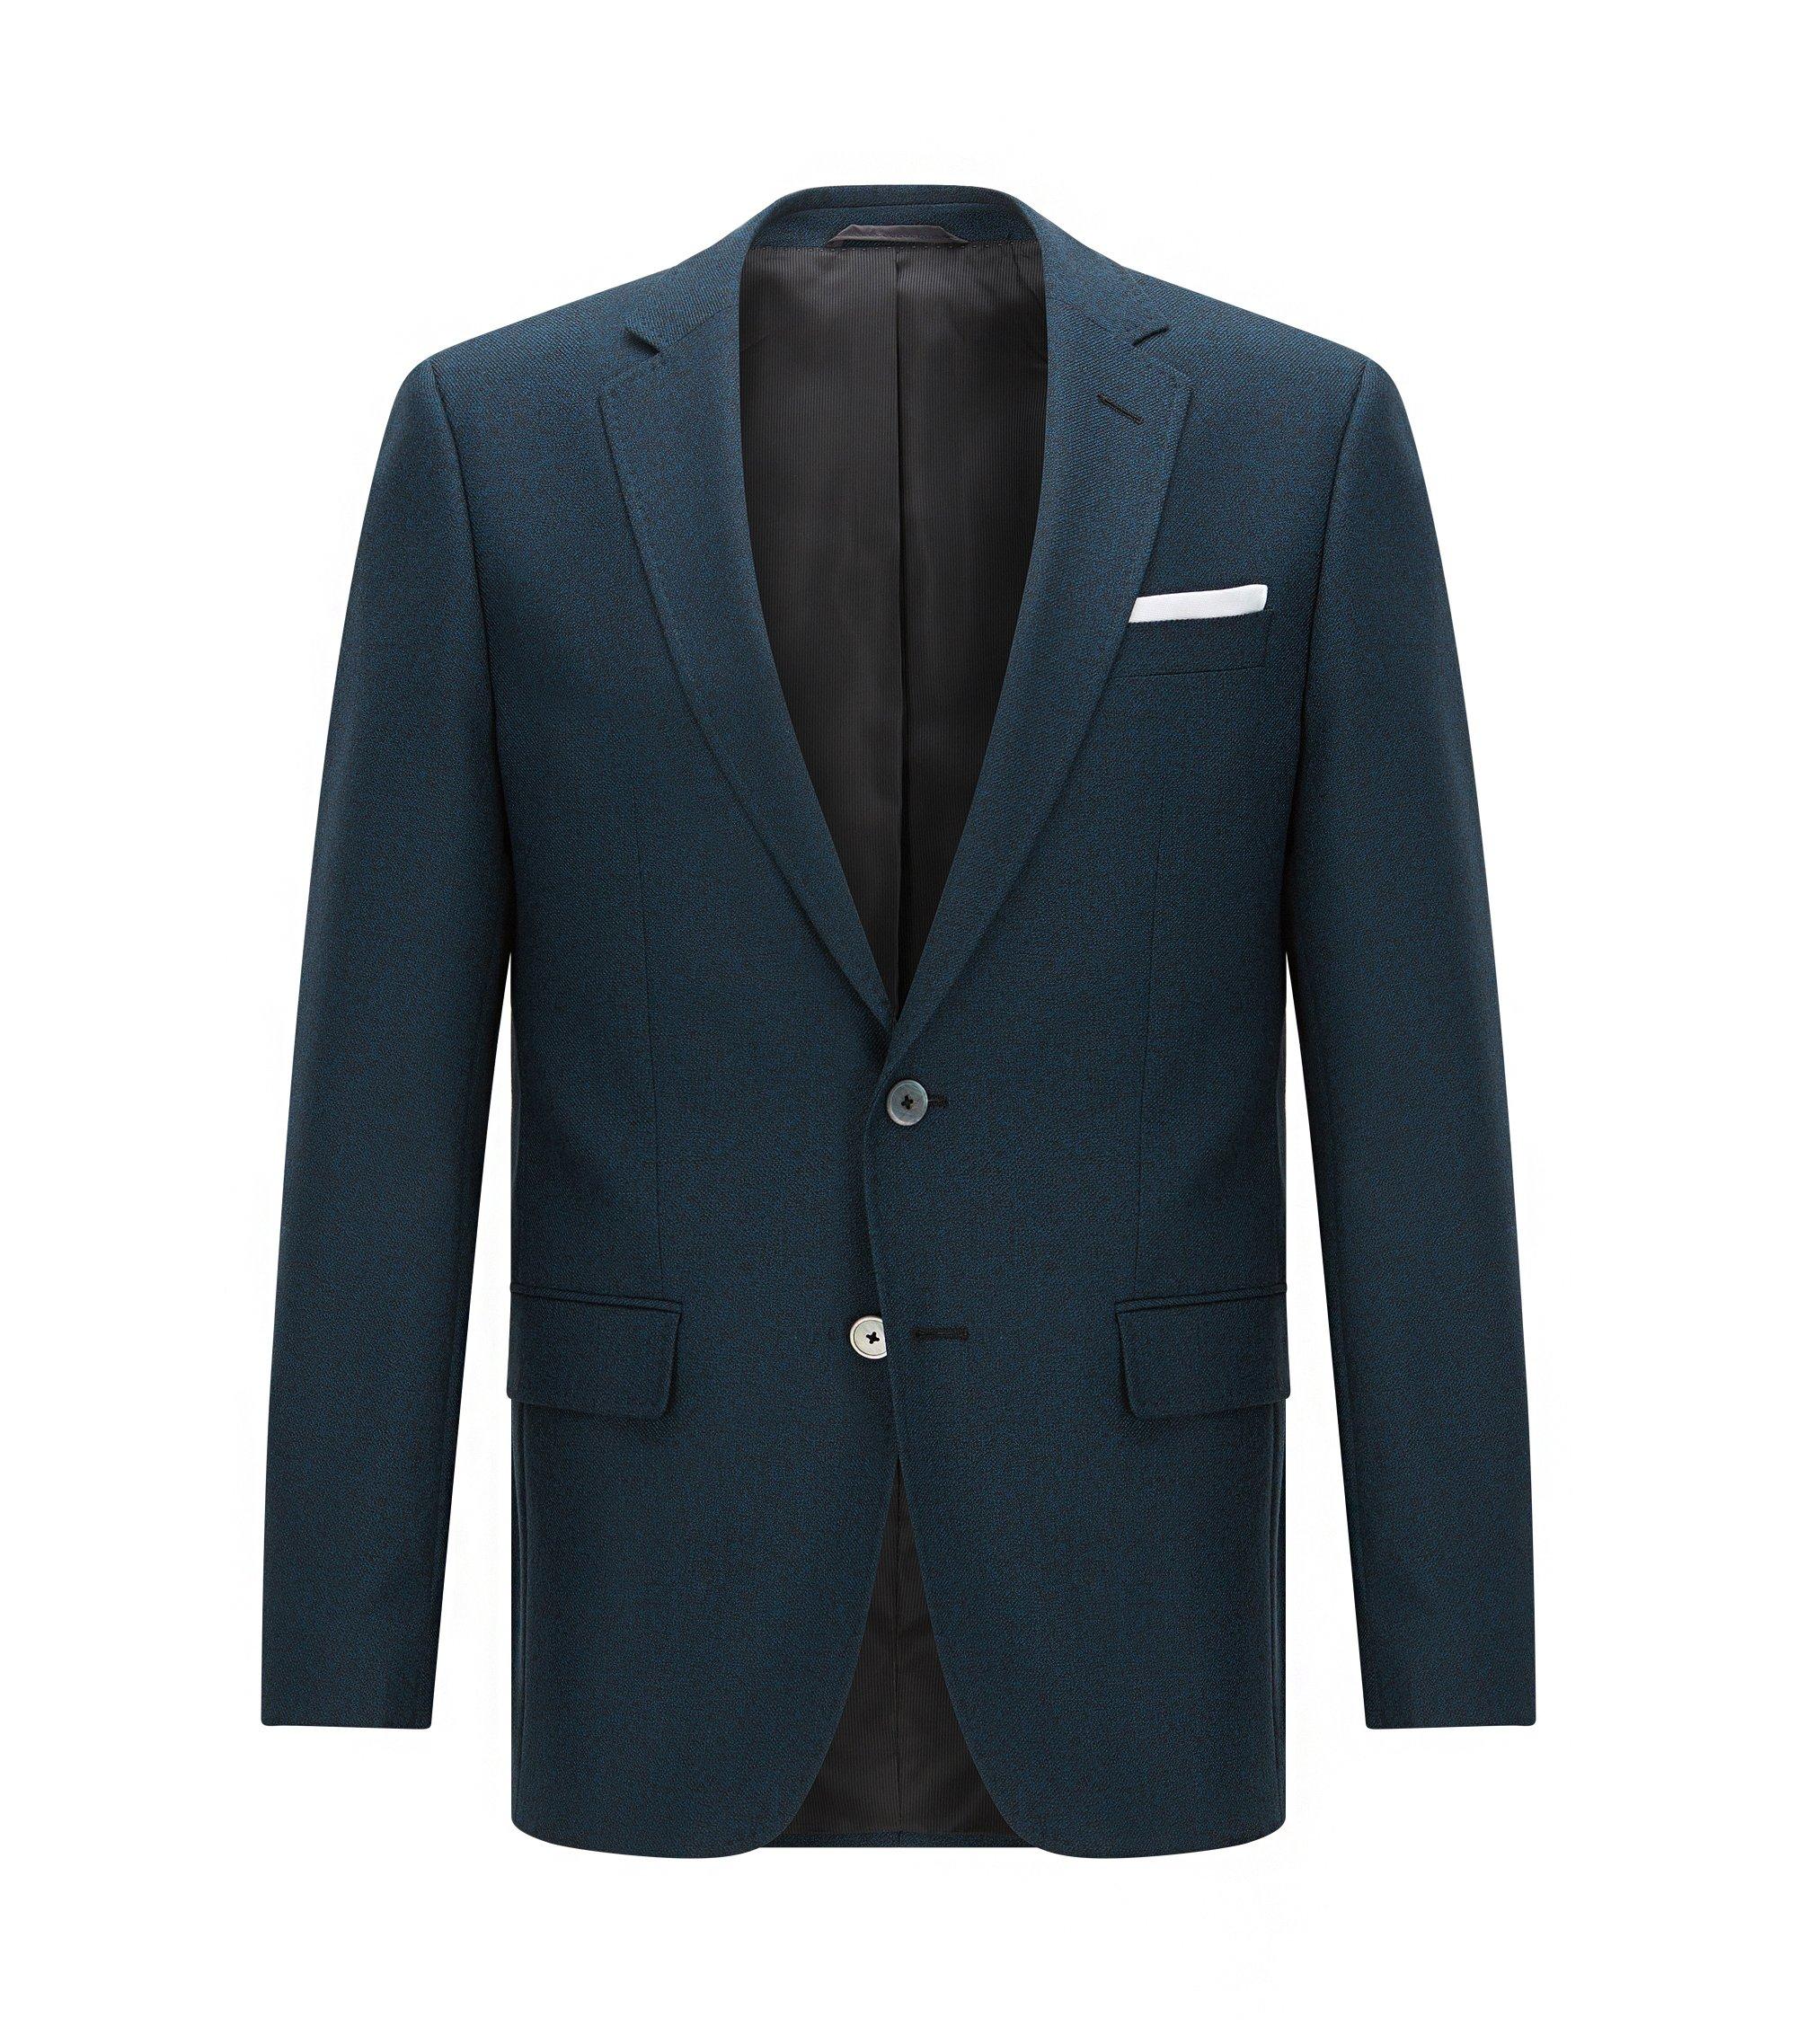 Virgin Wool Sport Coat, Slim Fit   Hutsons, Turquoise